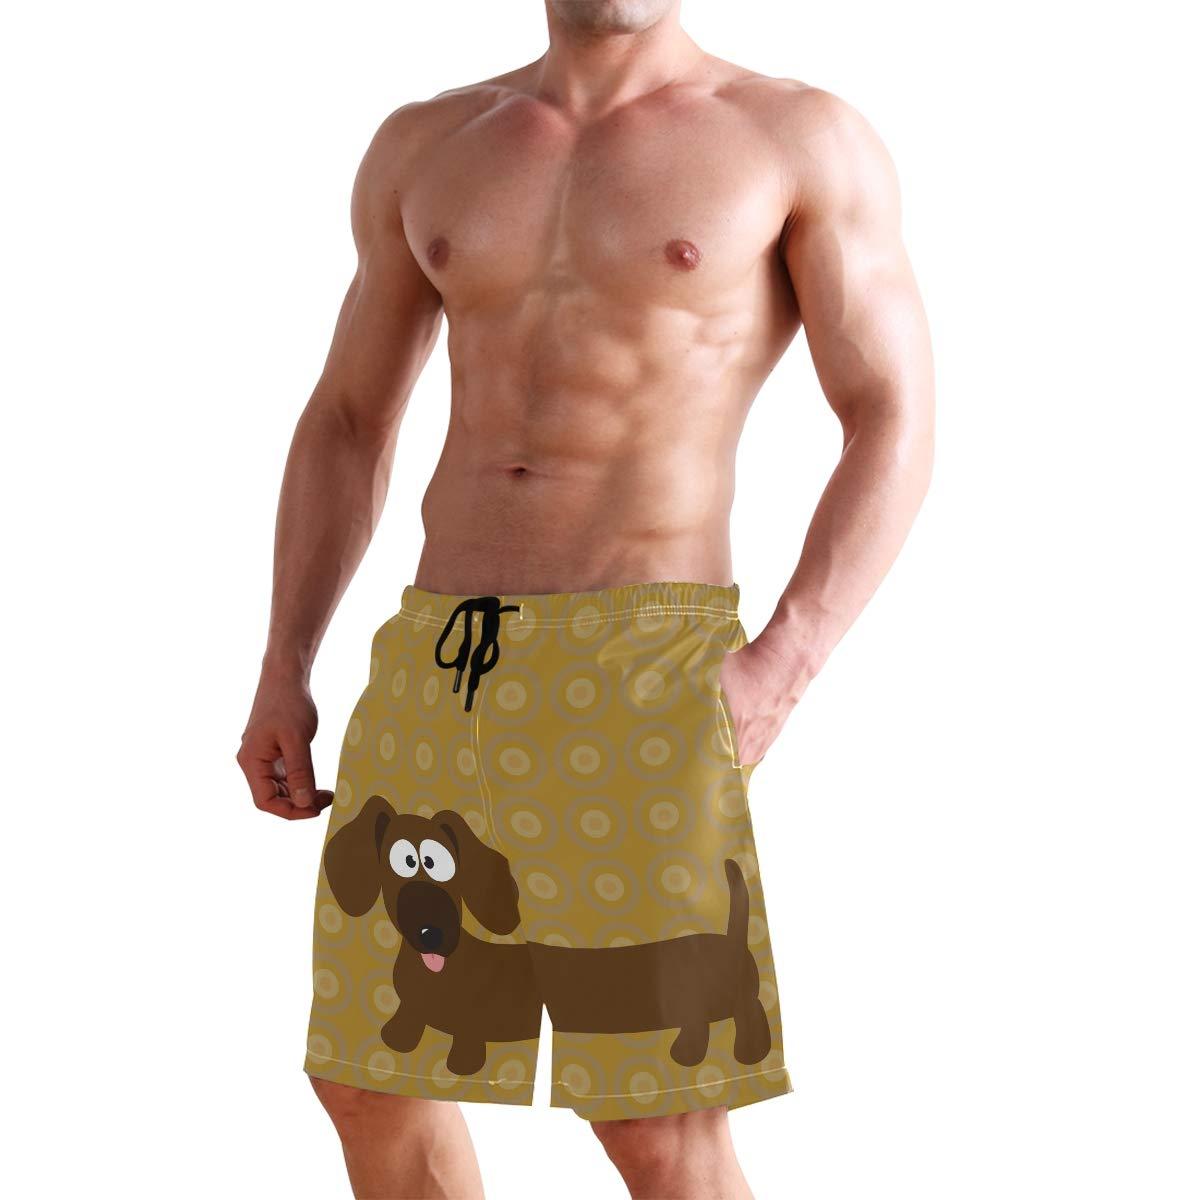 DEYYA Mens Dachshund Hot Dog Summer Beach Shorts Pants Swim Trunks Board Short for Men